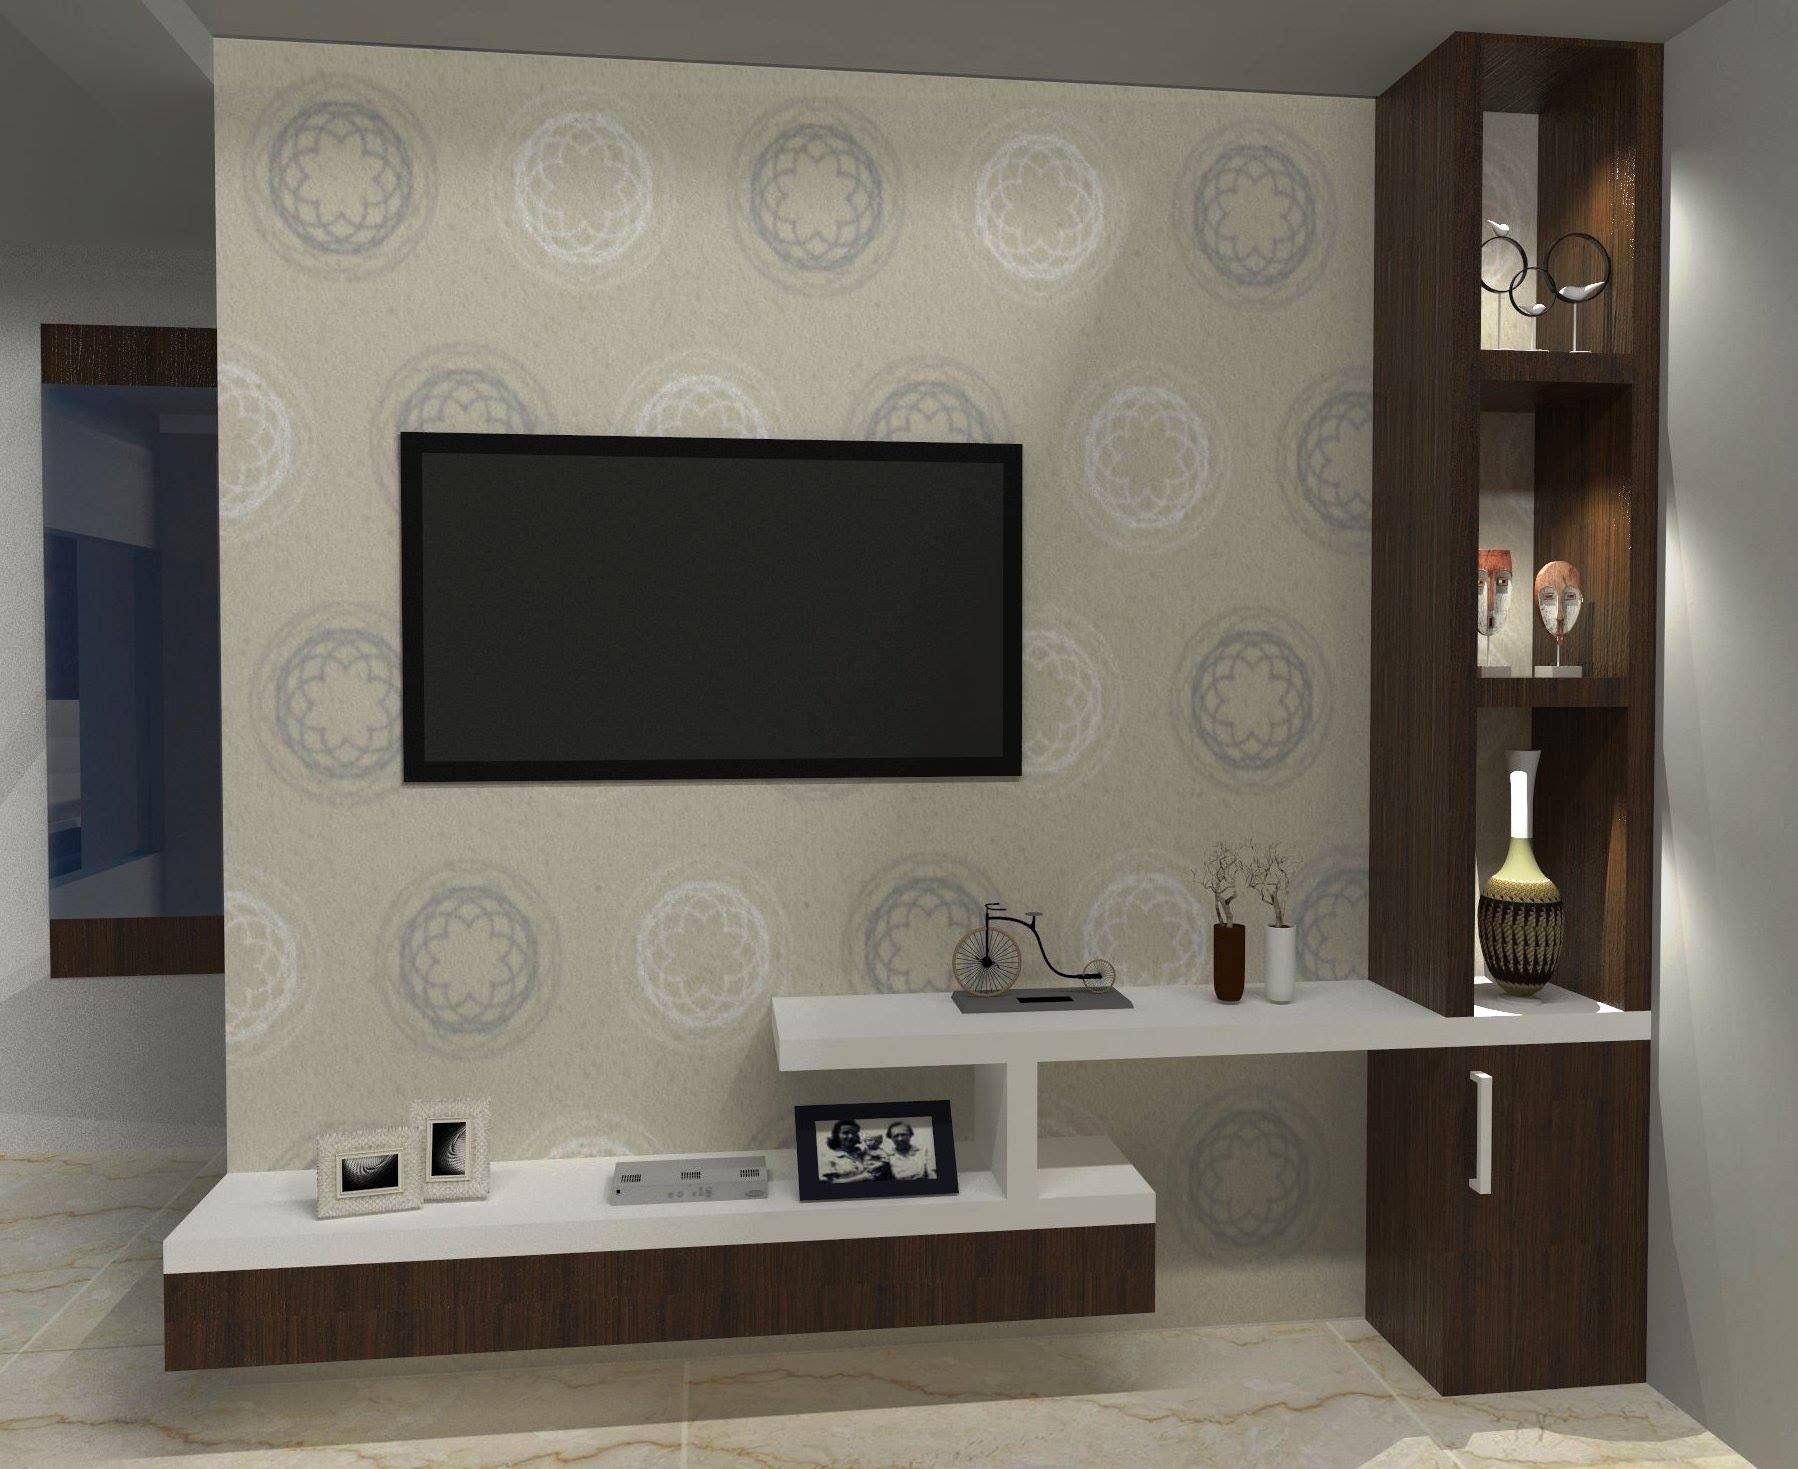 Pin By Urban Studio On L C D Design Wall Tv Unit Design Modern Tv Wall Units Tv Unit Furniture